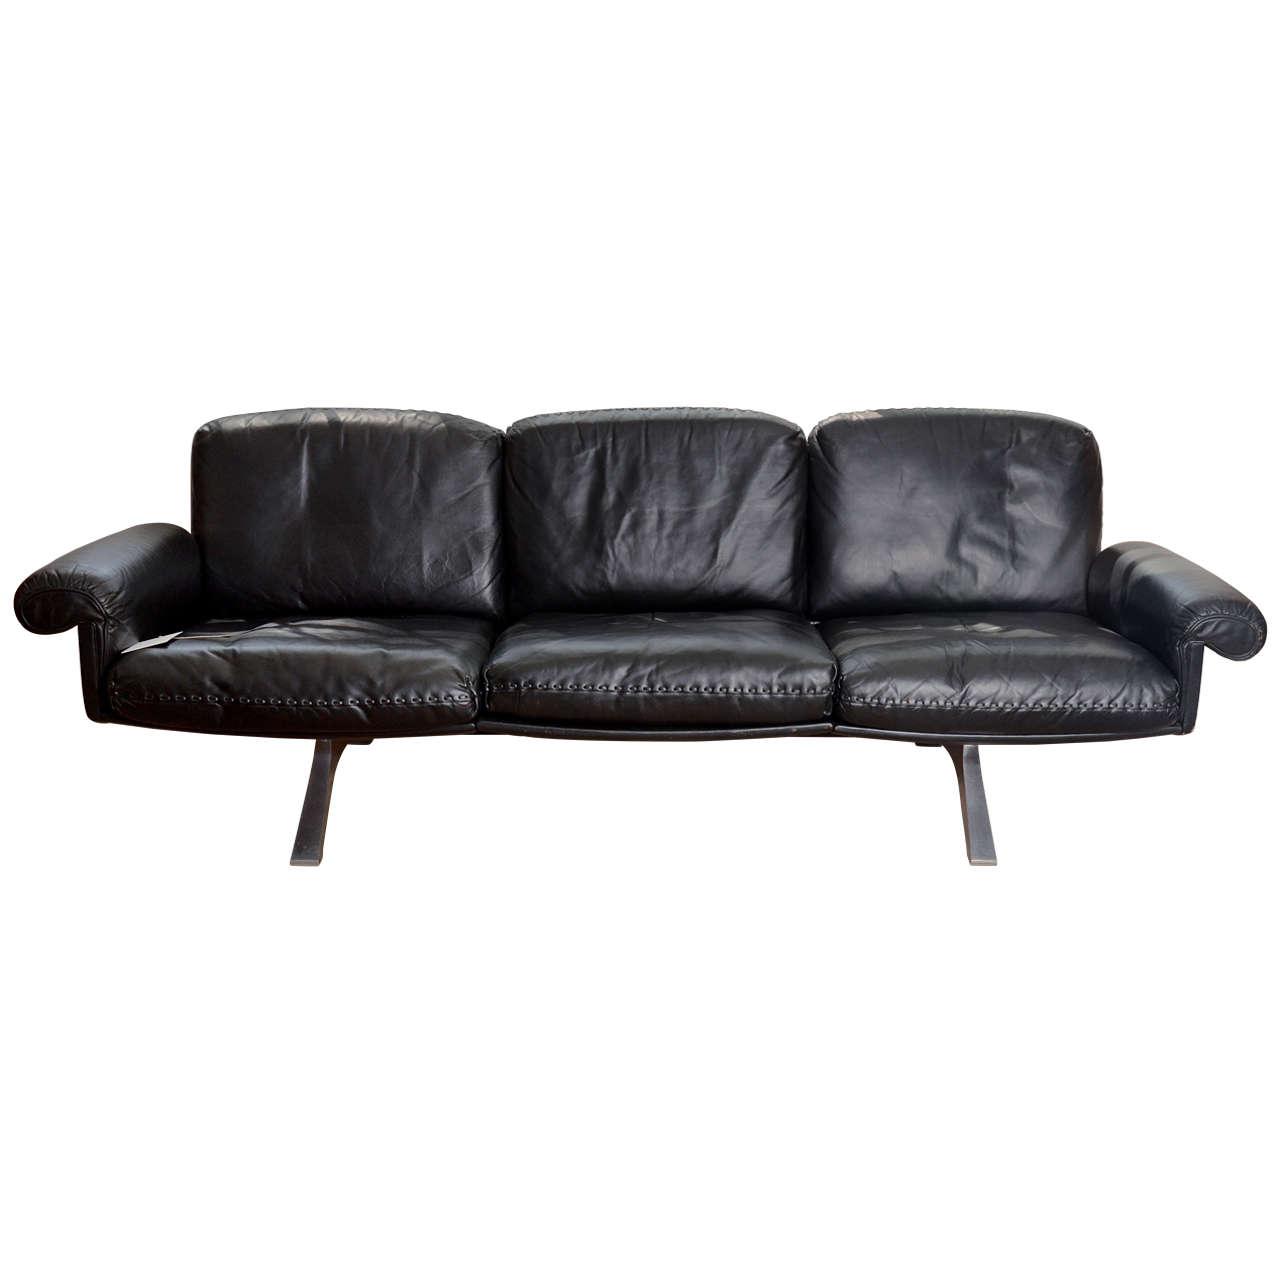 1970\'s De Sede Black Leather Sofa on Chrome Legs